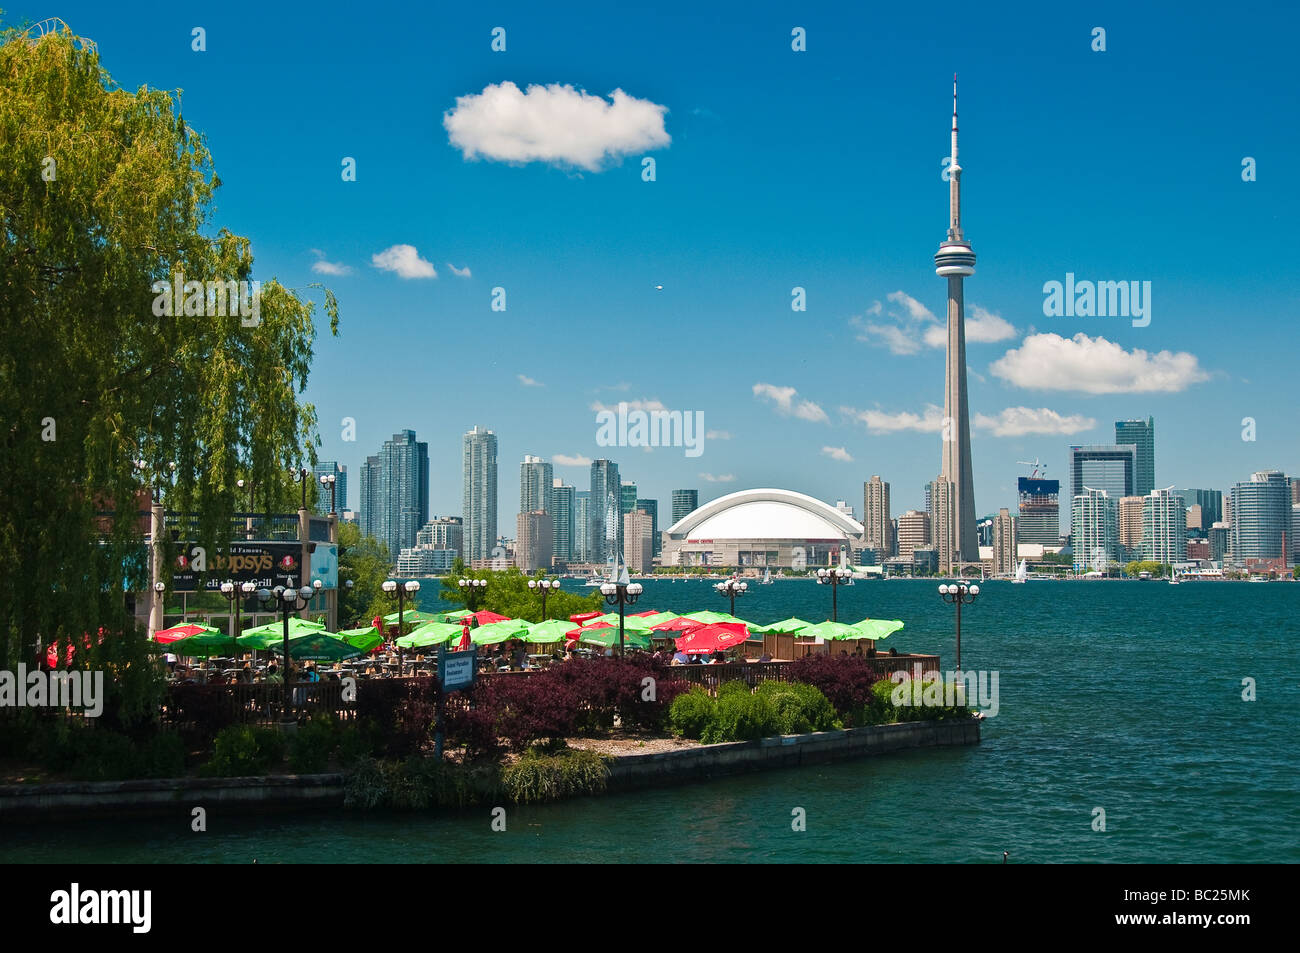 View of Toronto Skyline from Center Island across Lake Ontario, Canada - Stock Image